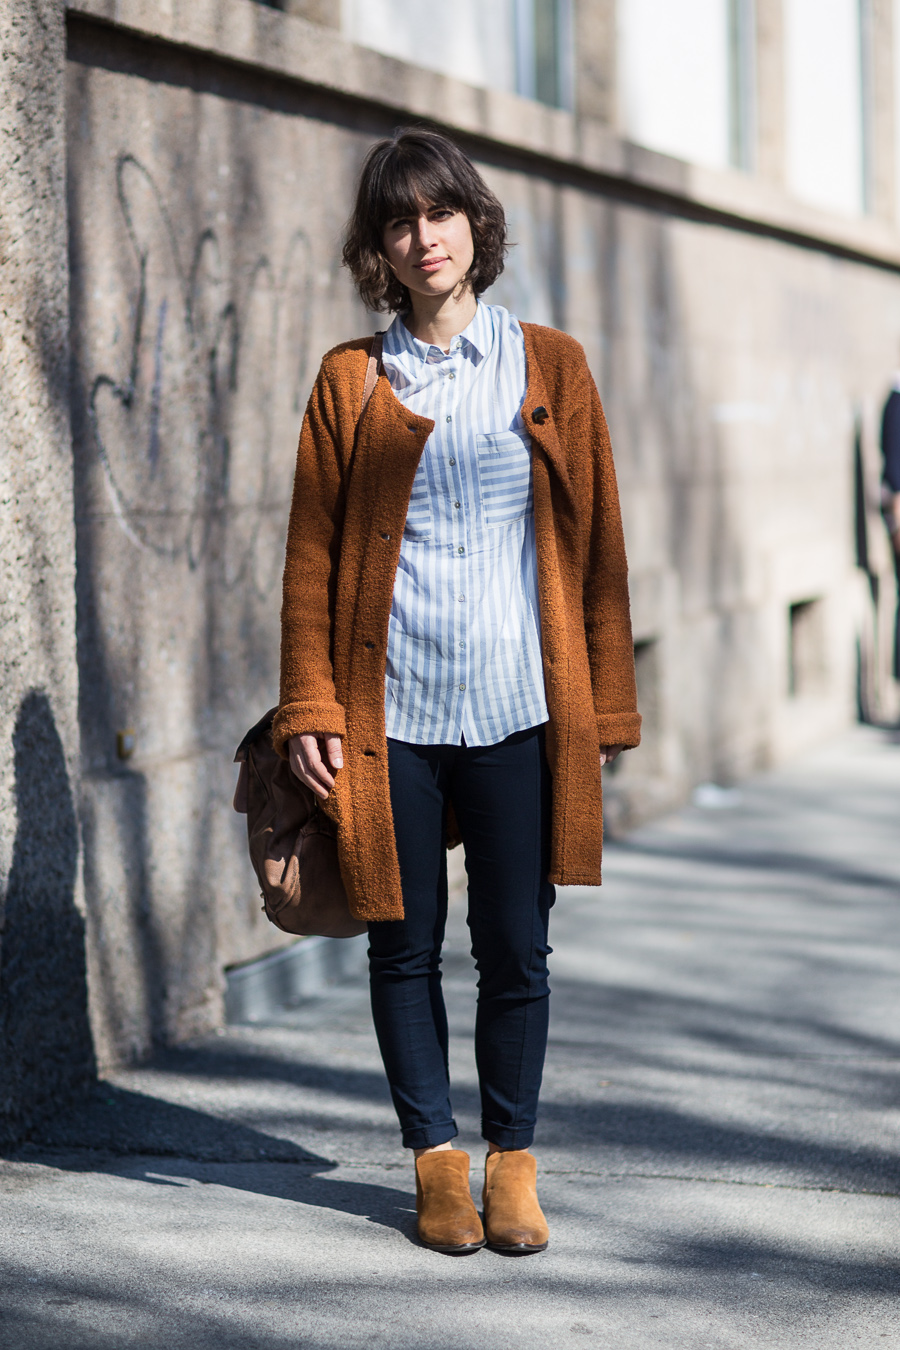 street-style-fashion-blog-innsbruck-vintage-markt-2.jpg